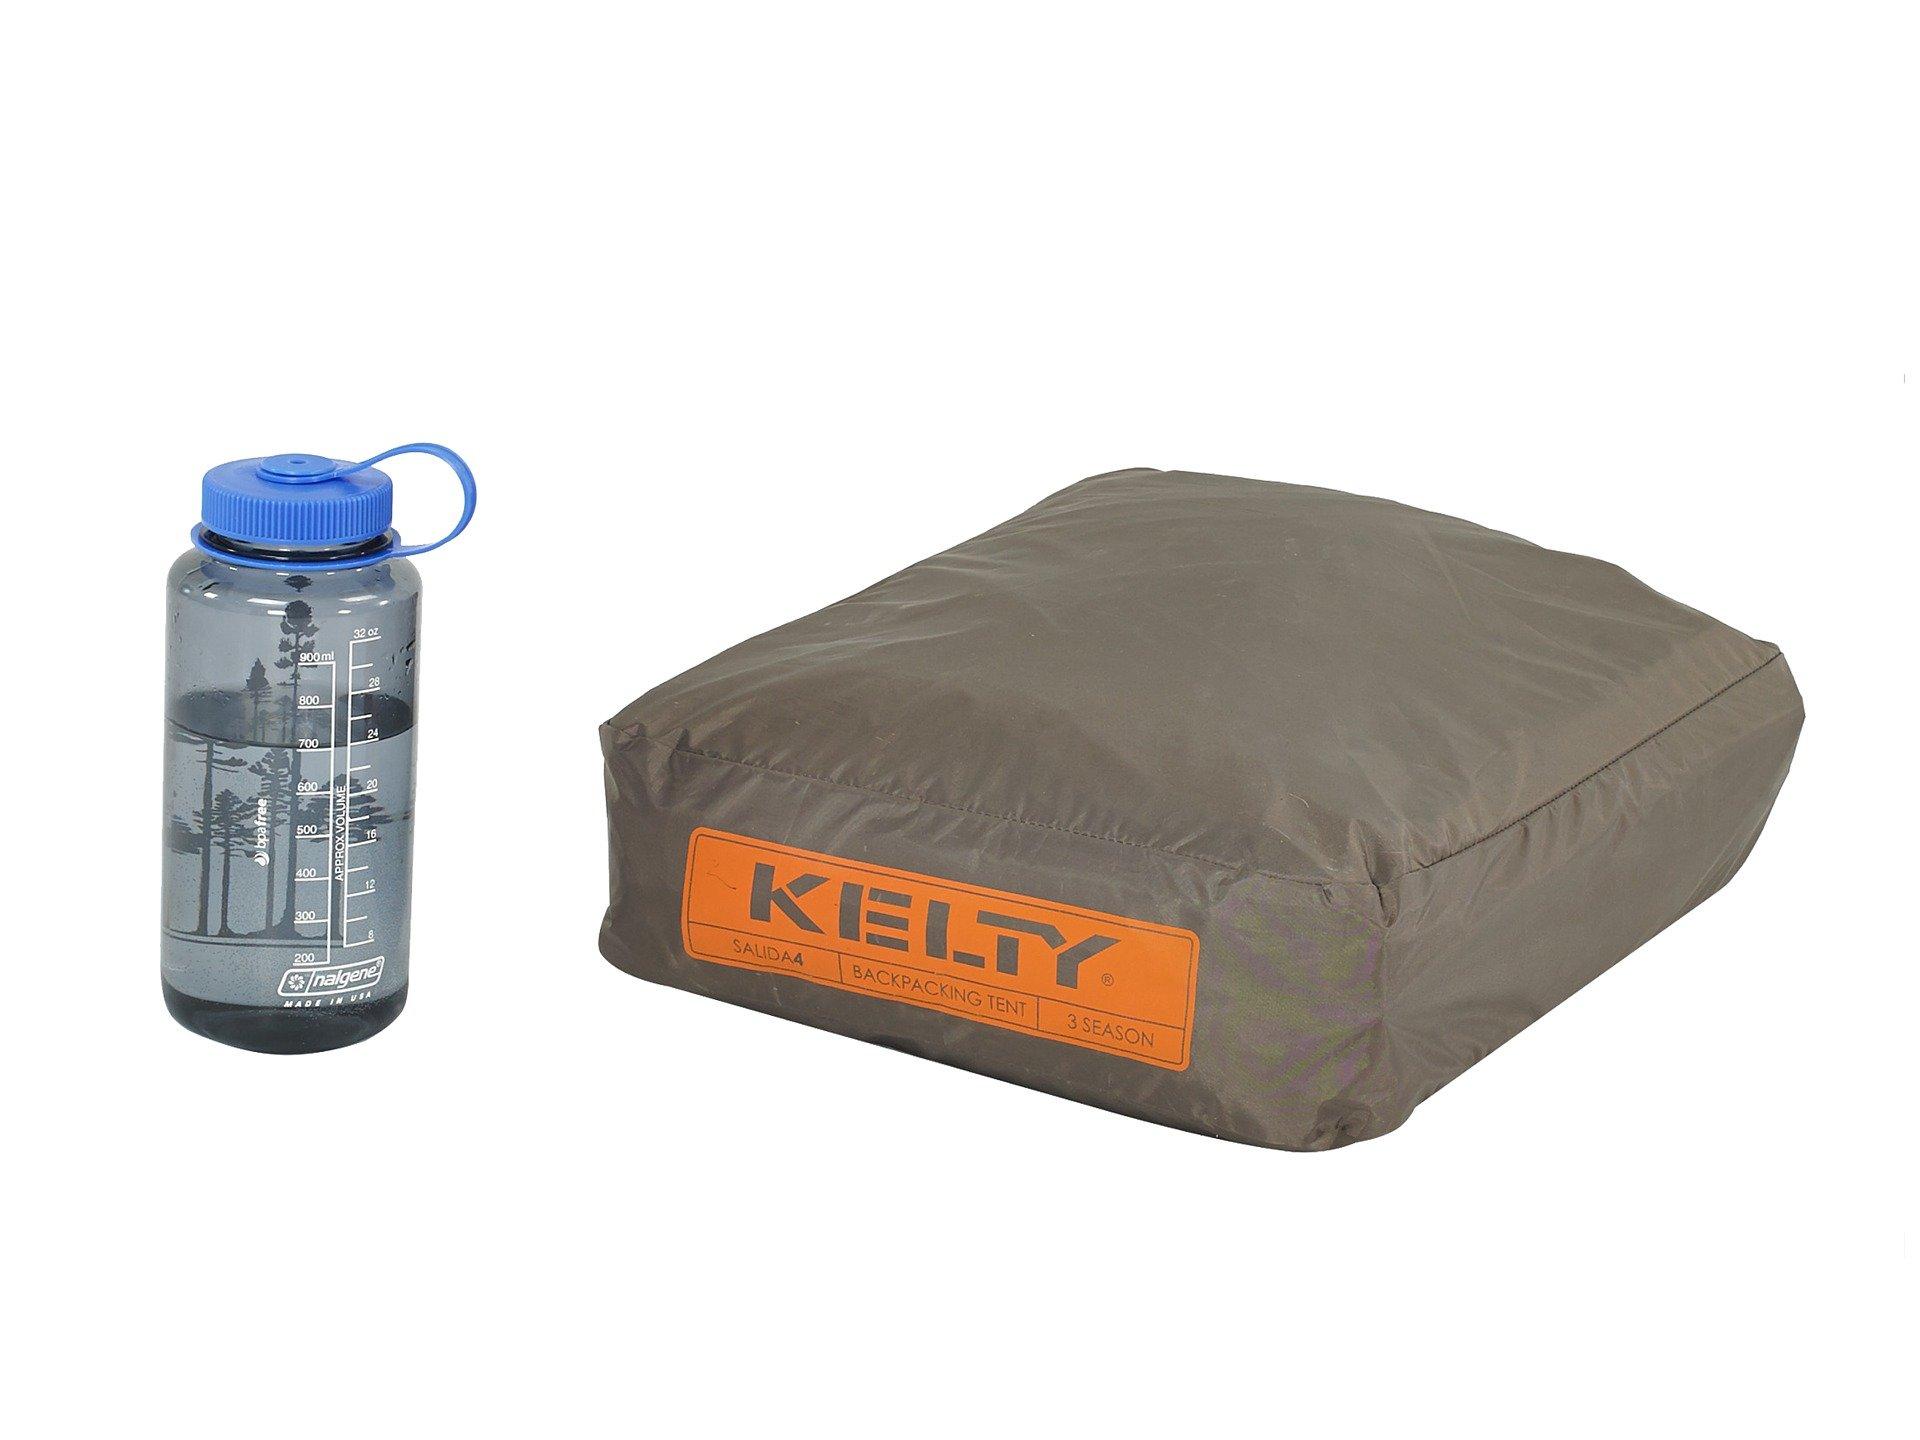 Kelty Salida 4 Tent  sc 1 st  Zappos & Kelty Salida 4 Tent at Zappos.com